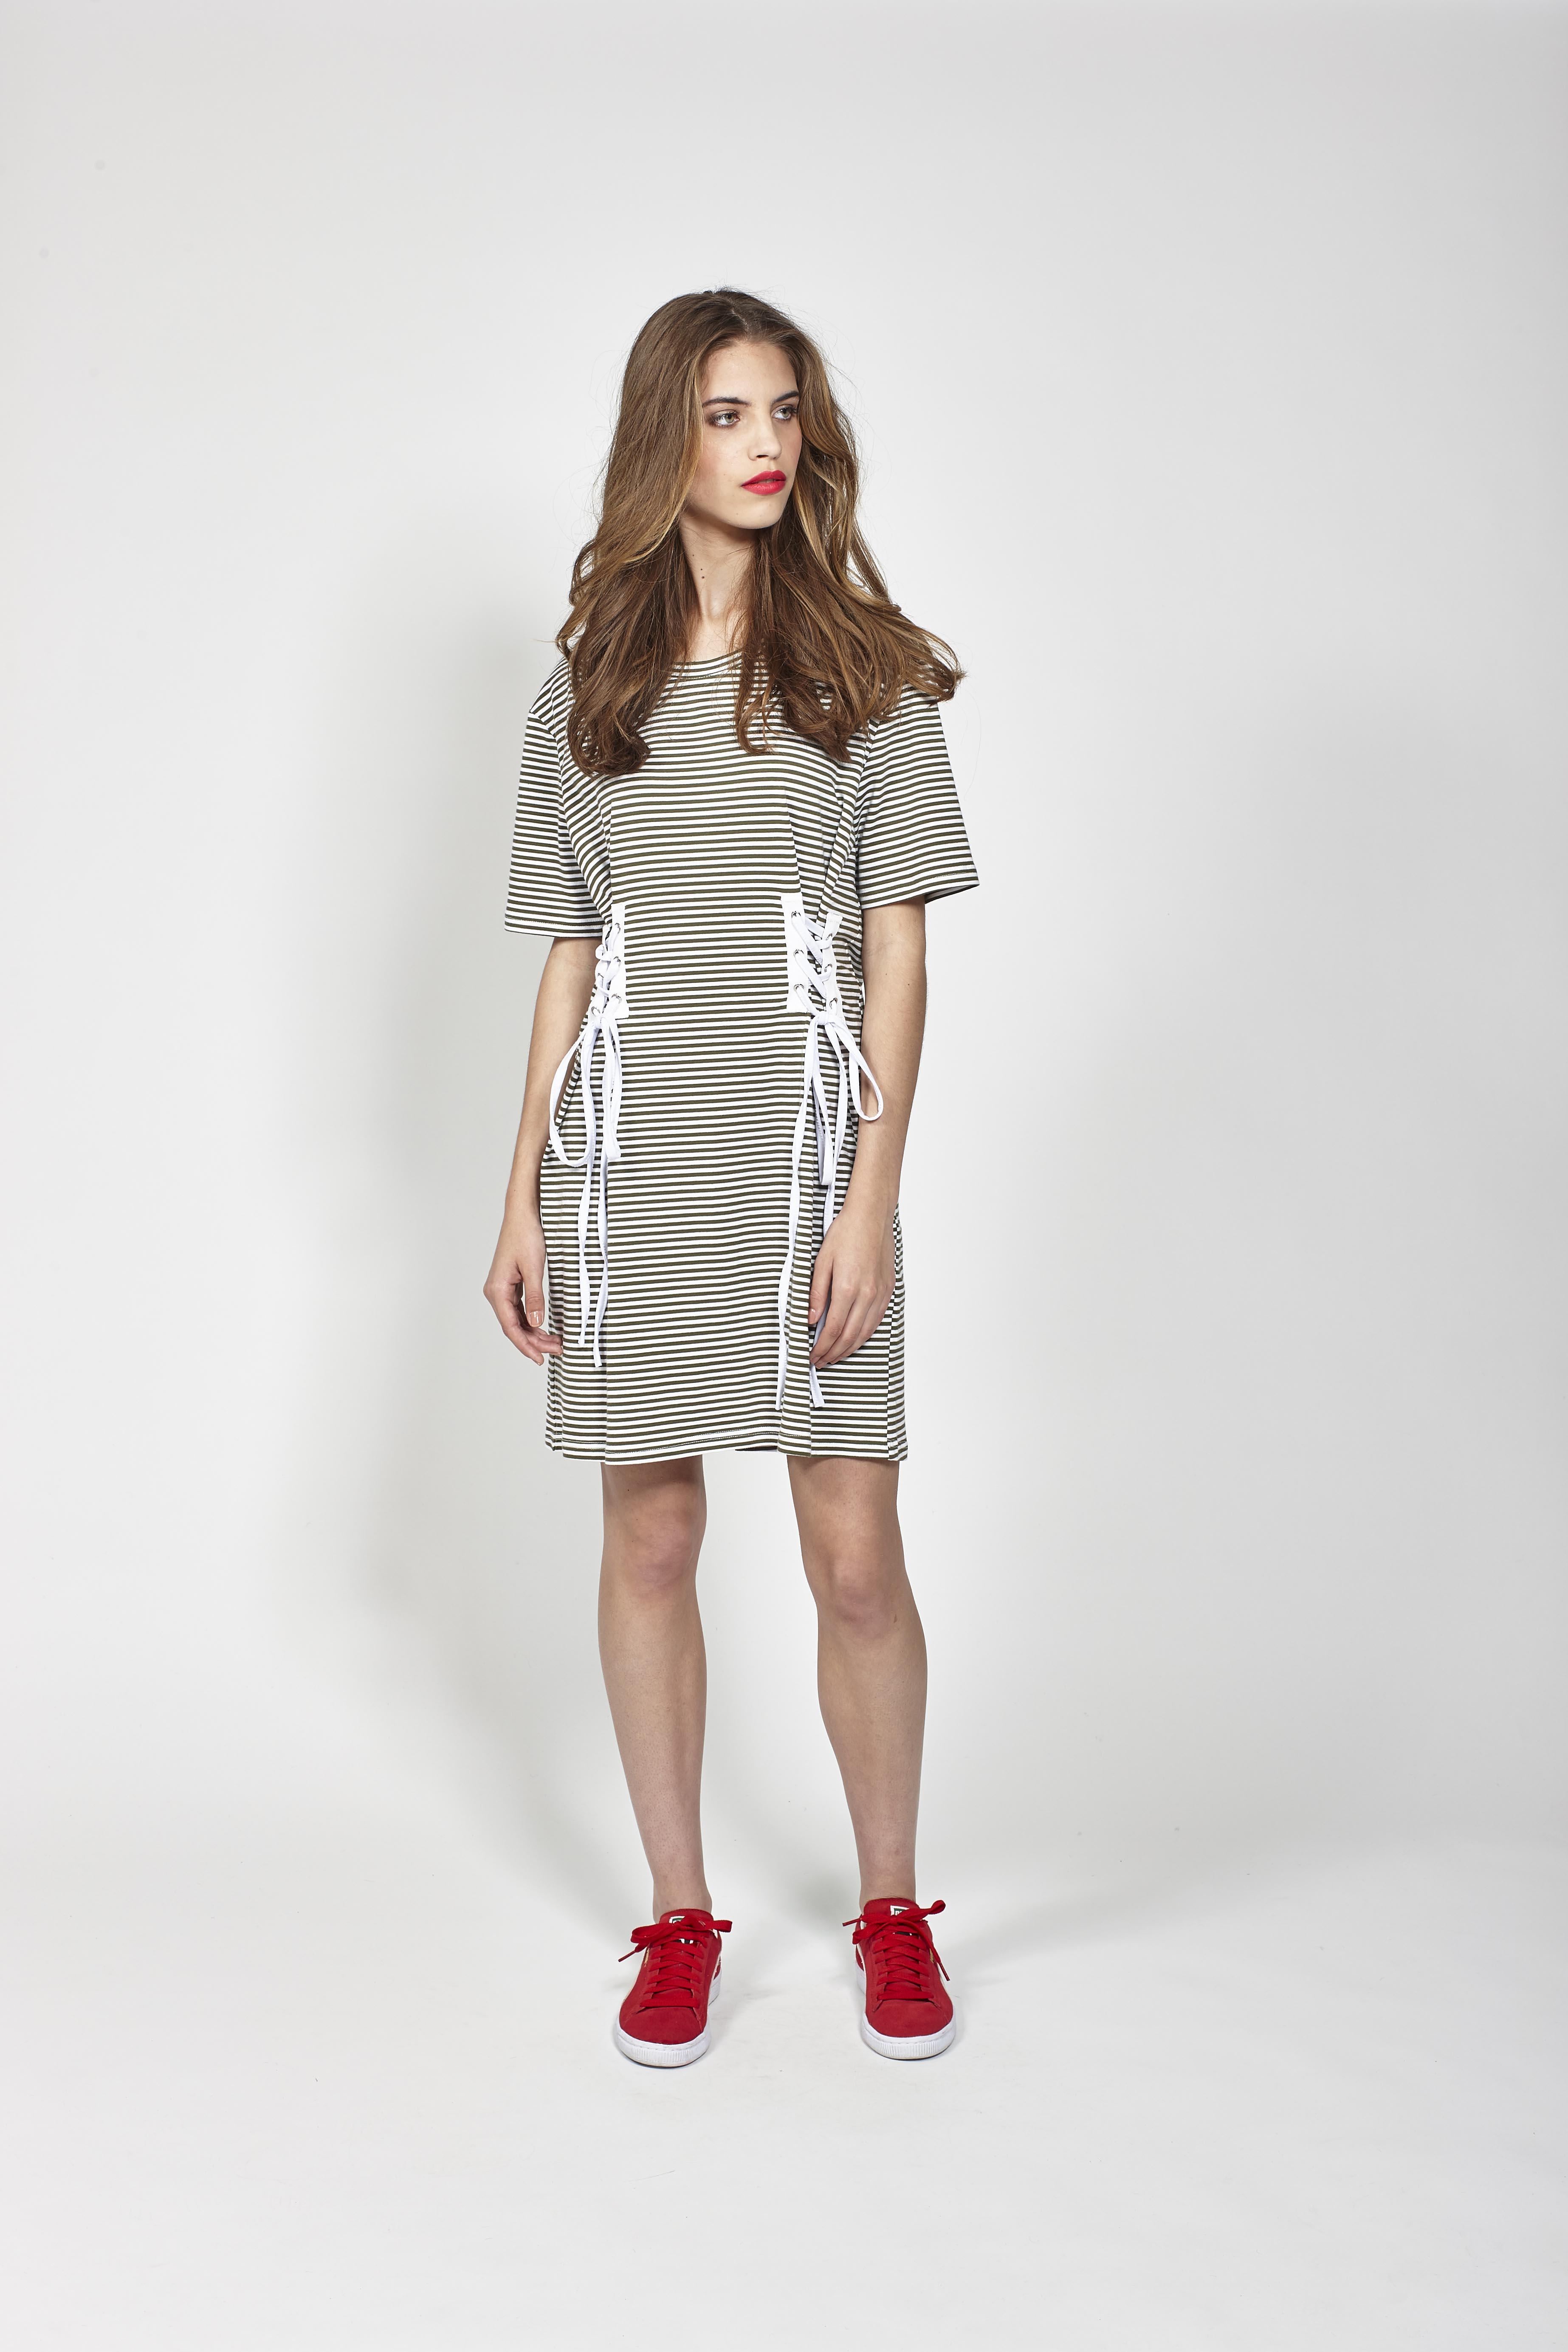 LB1079 LEO+BE Grove Dress, RRP$139.00